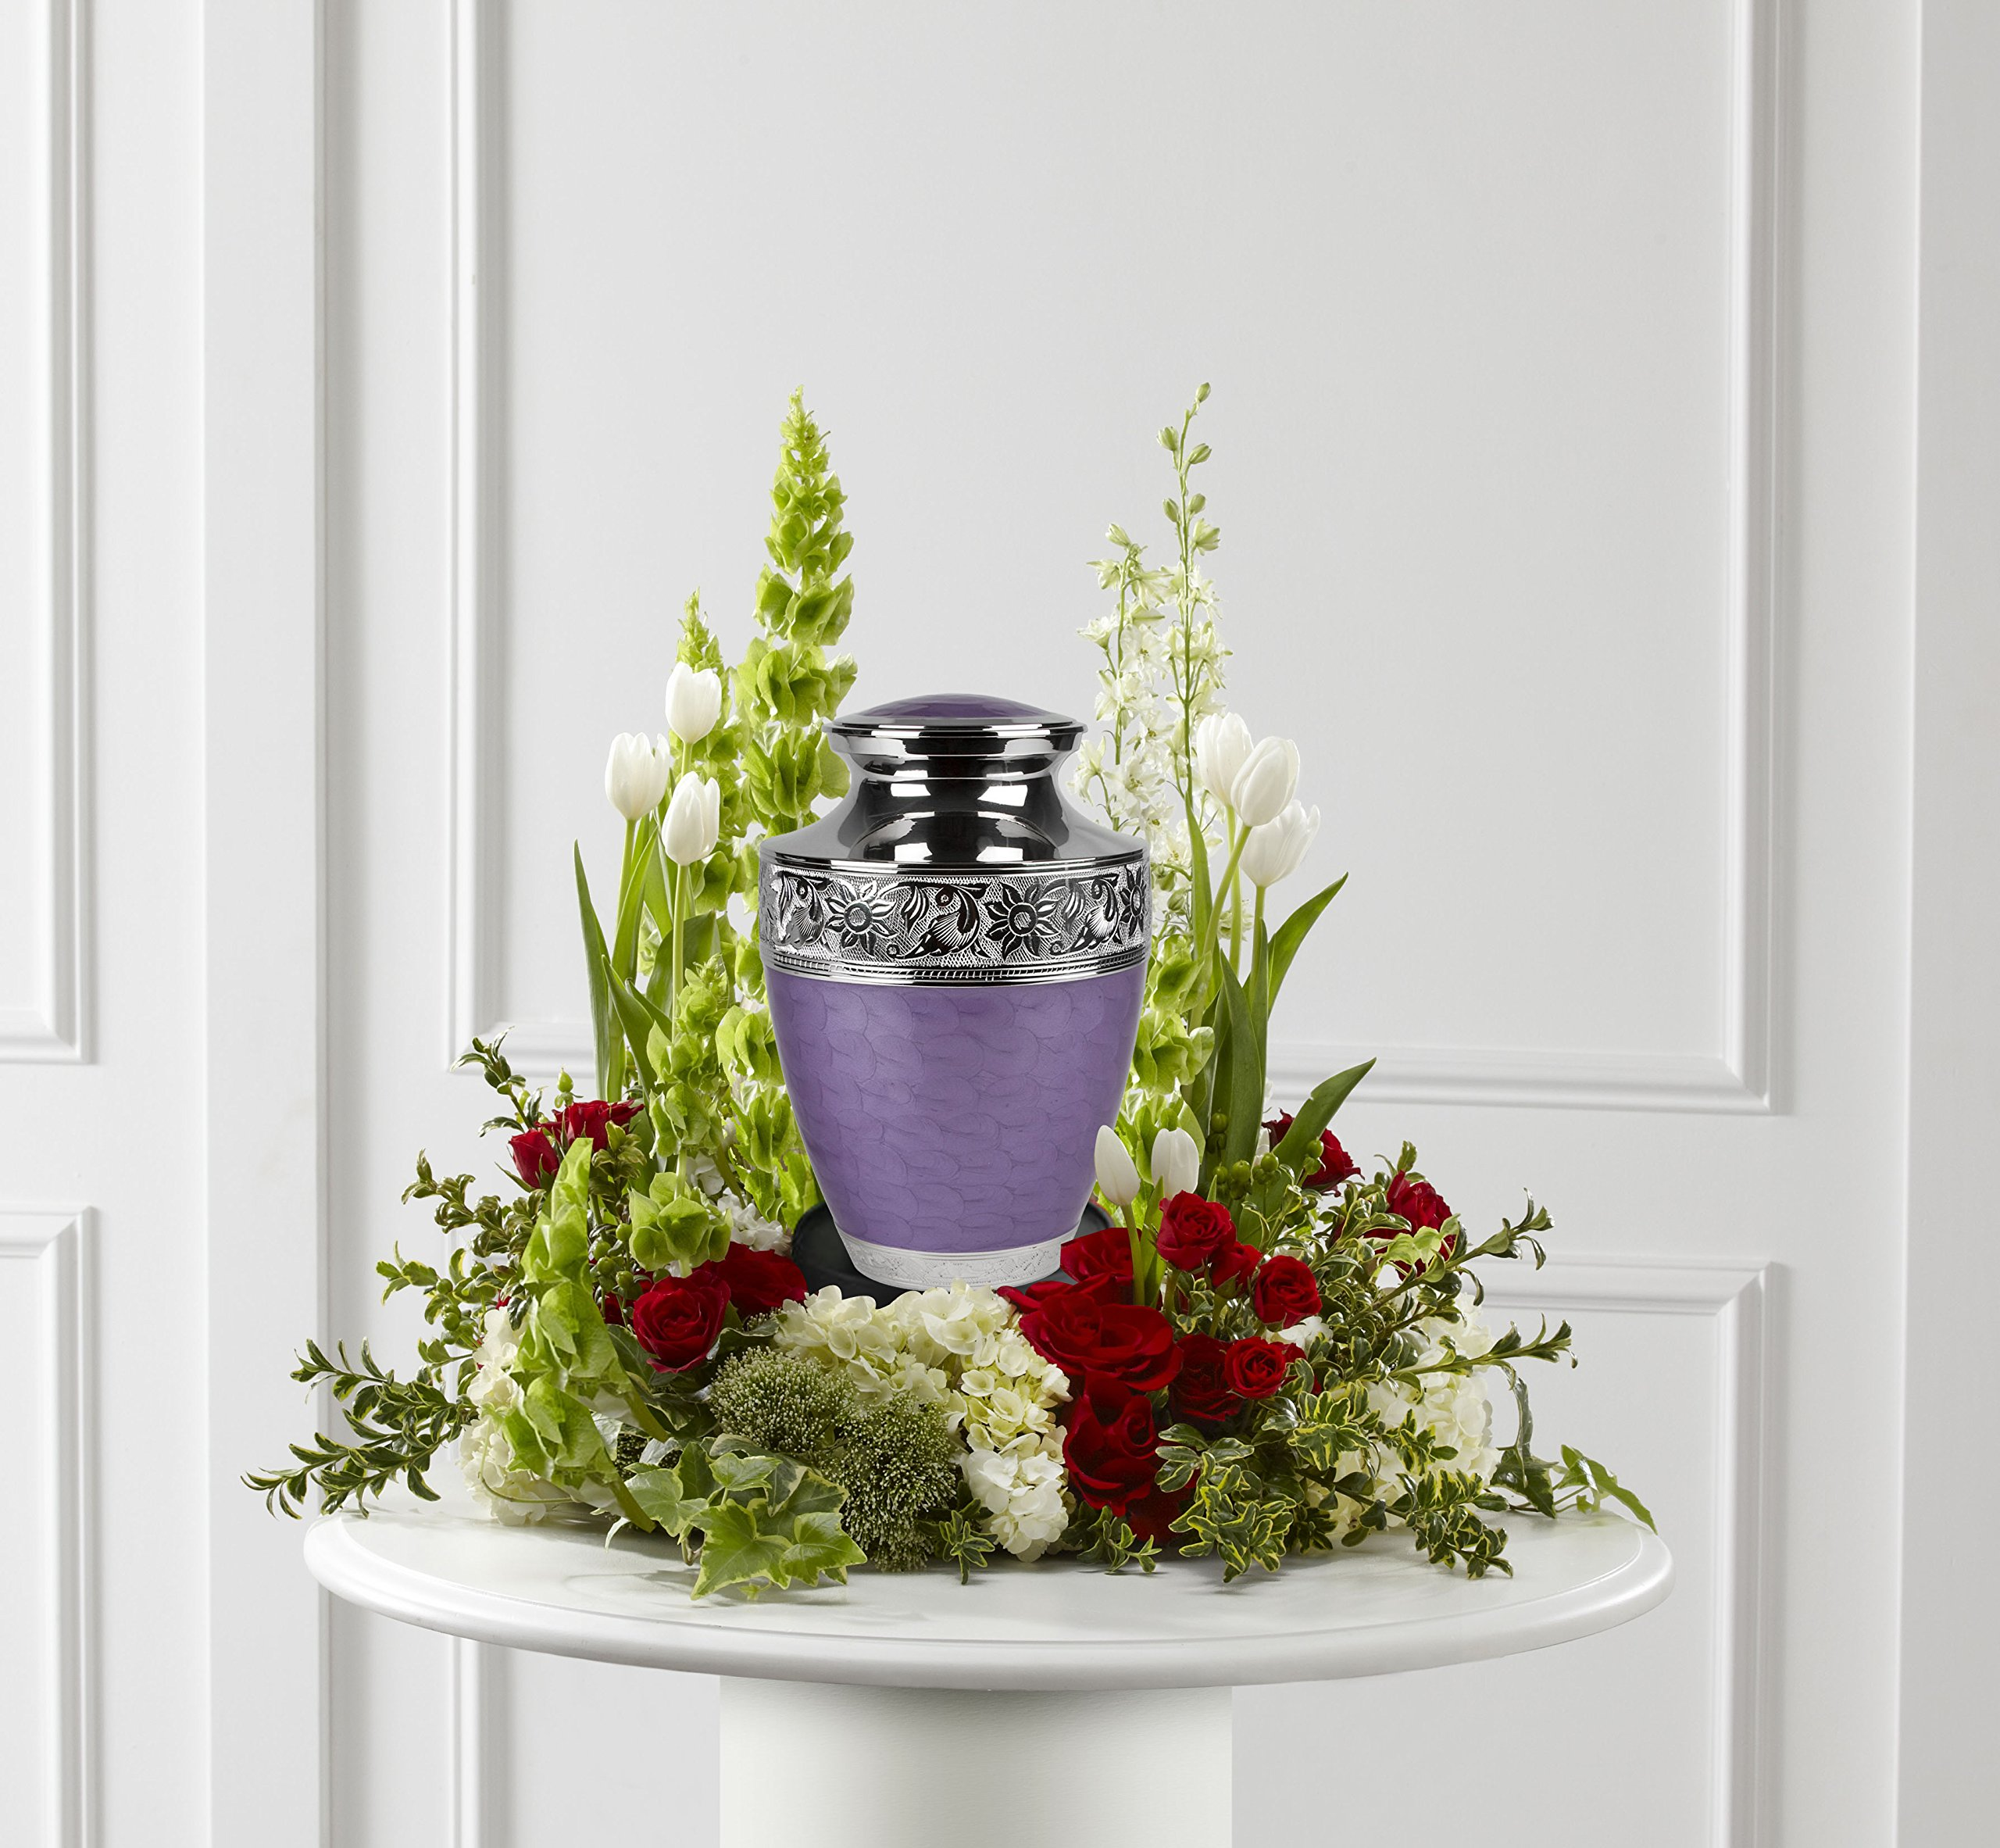 Large Lavender Bloom Cremation Urn for Human Ashes- Lavender Urn - Adult Funeral Urn Handcrafted with Engraved Silver Bands - Brass Urn - Large Urn Deal with Free Bag